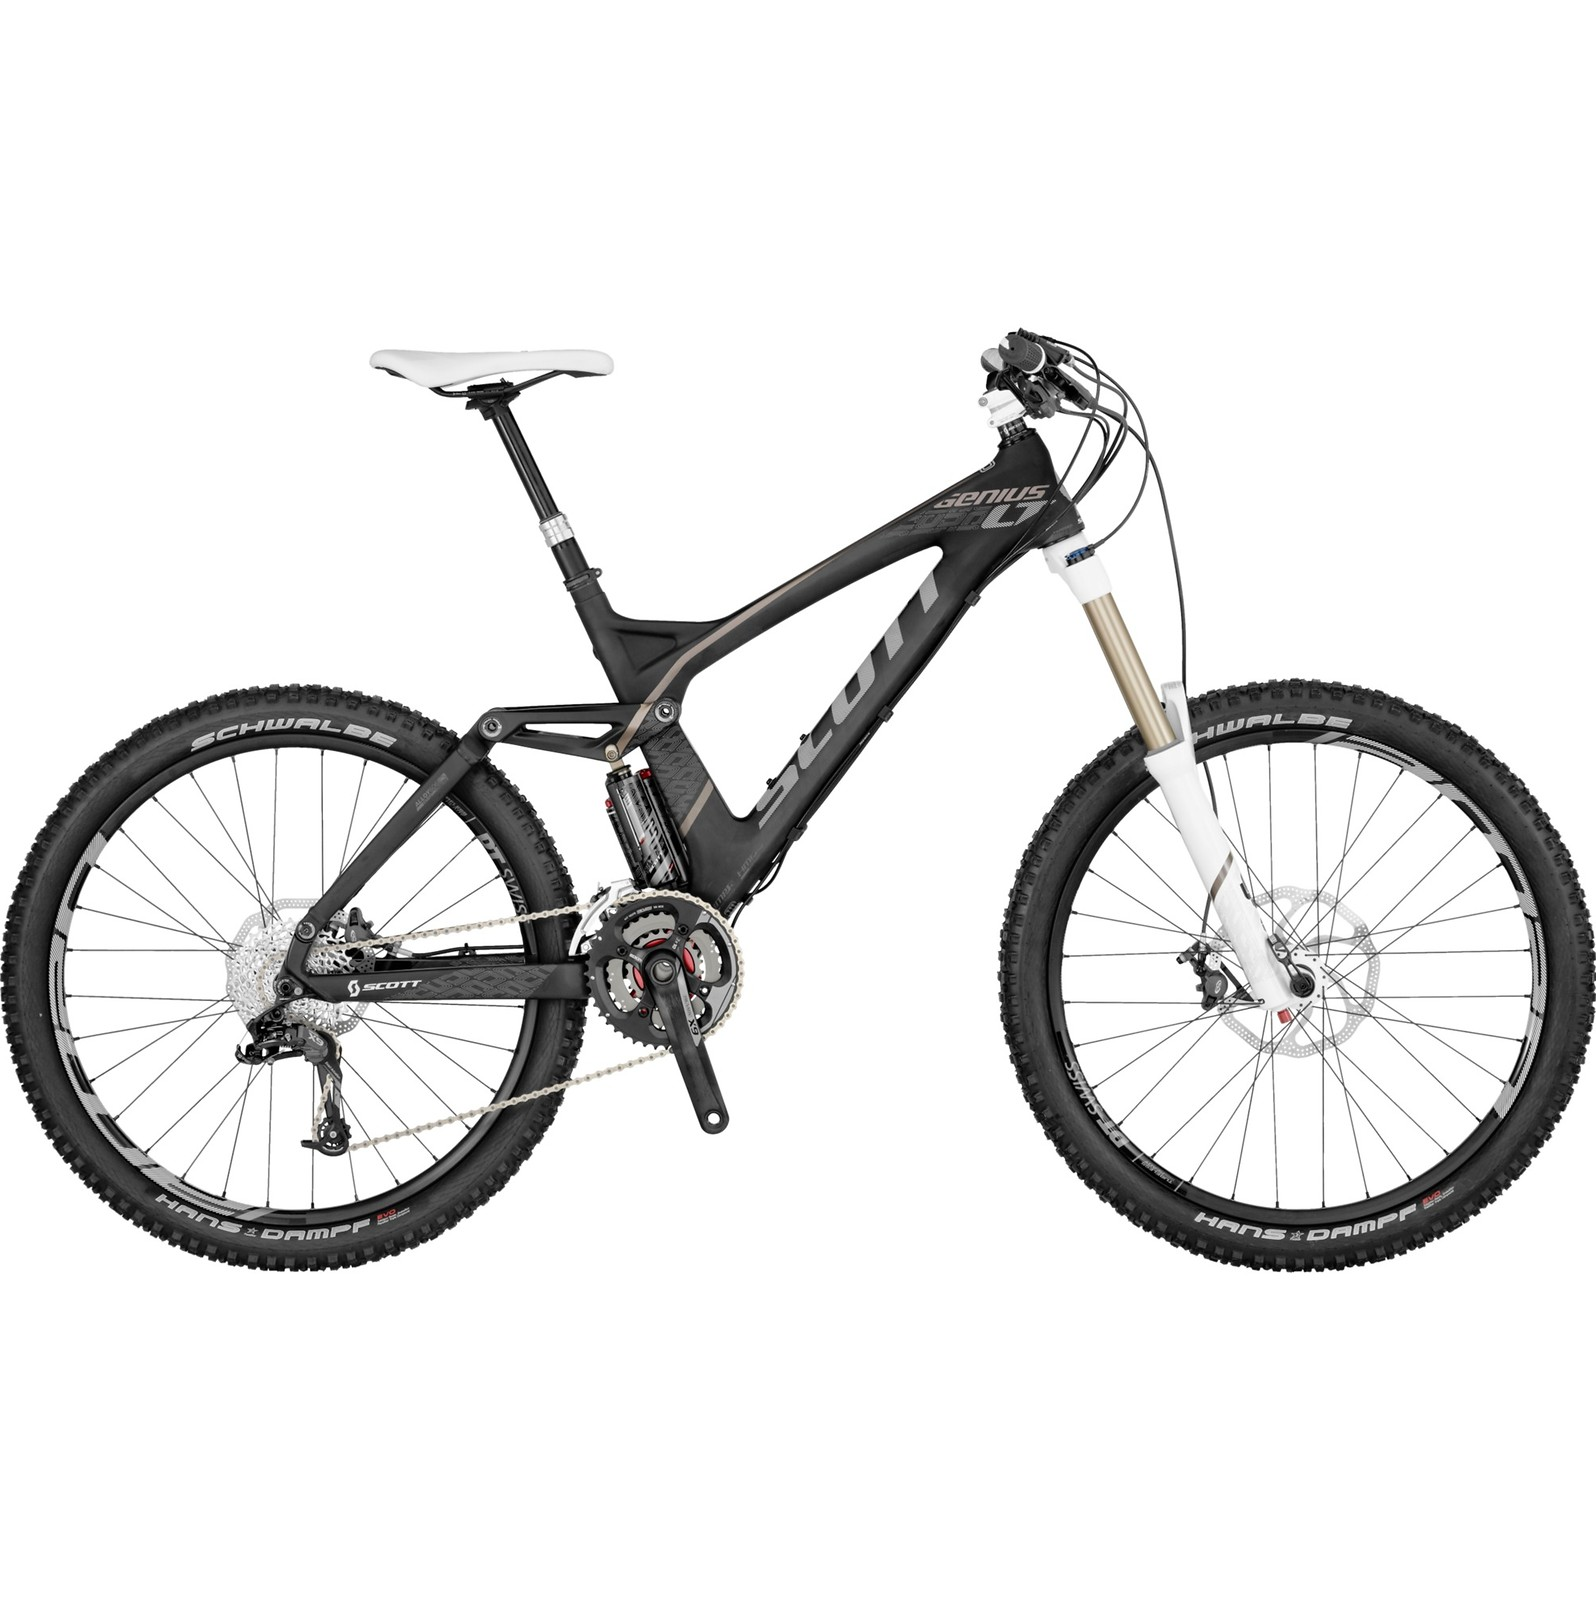 2012 Scott Genius LT 20 Bike 221735